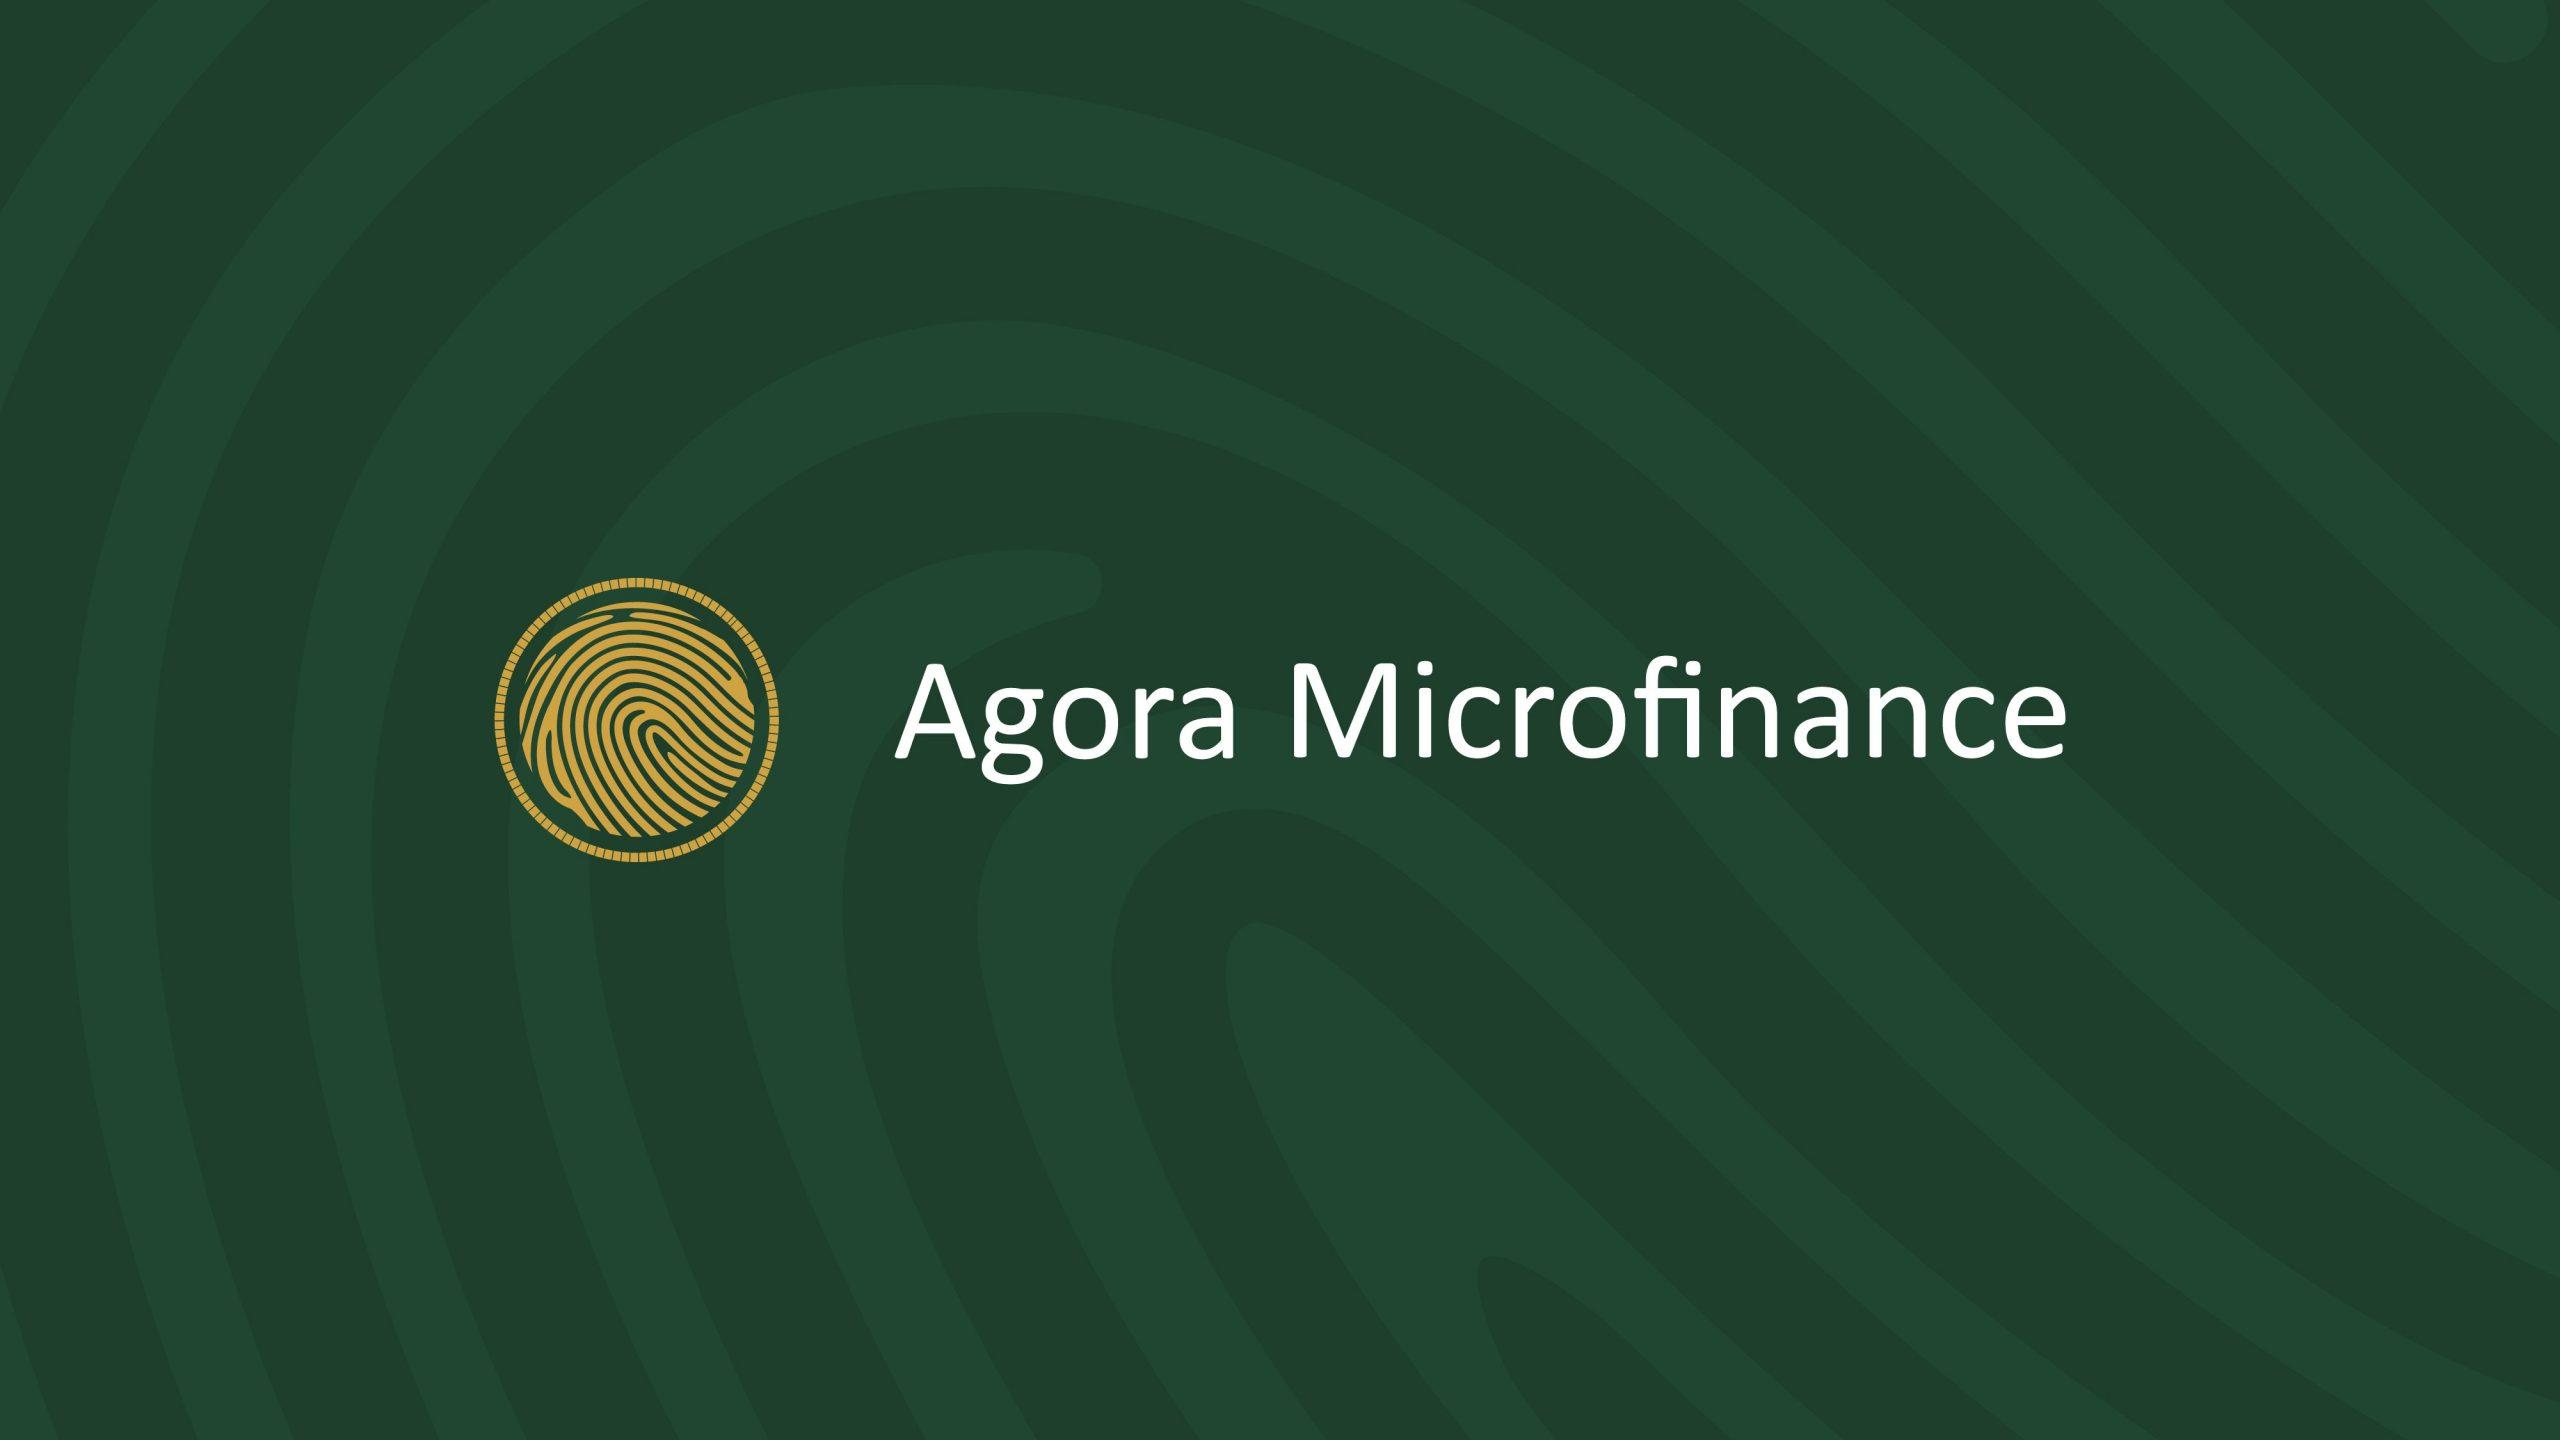 agora microfinance brand design